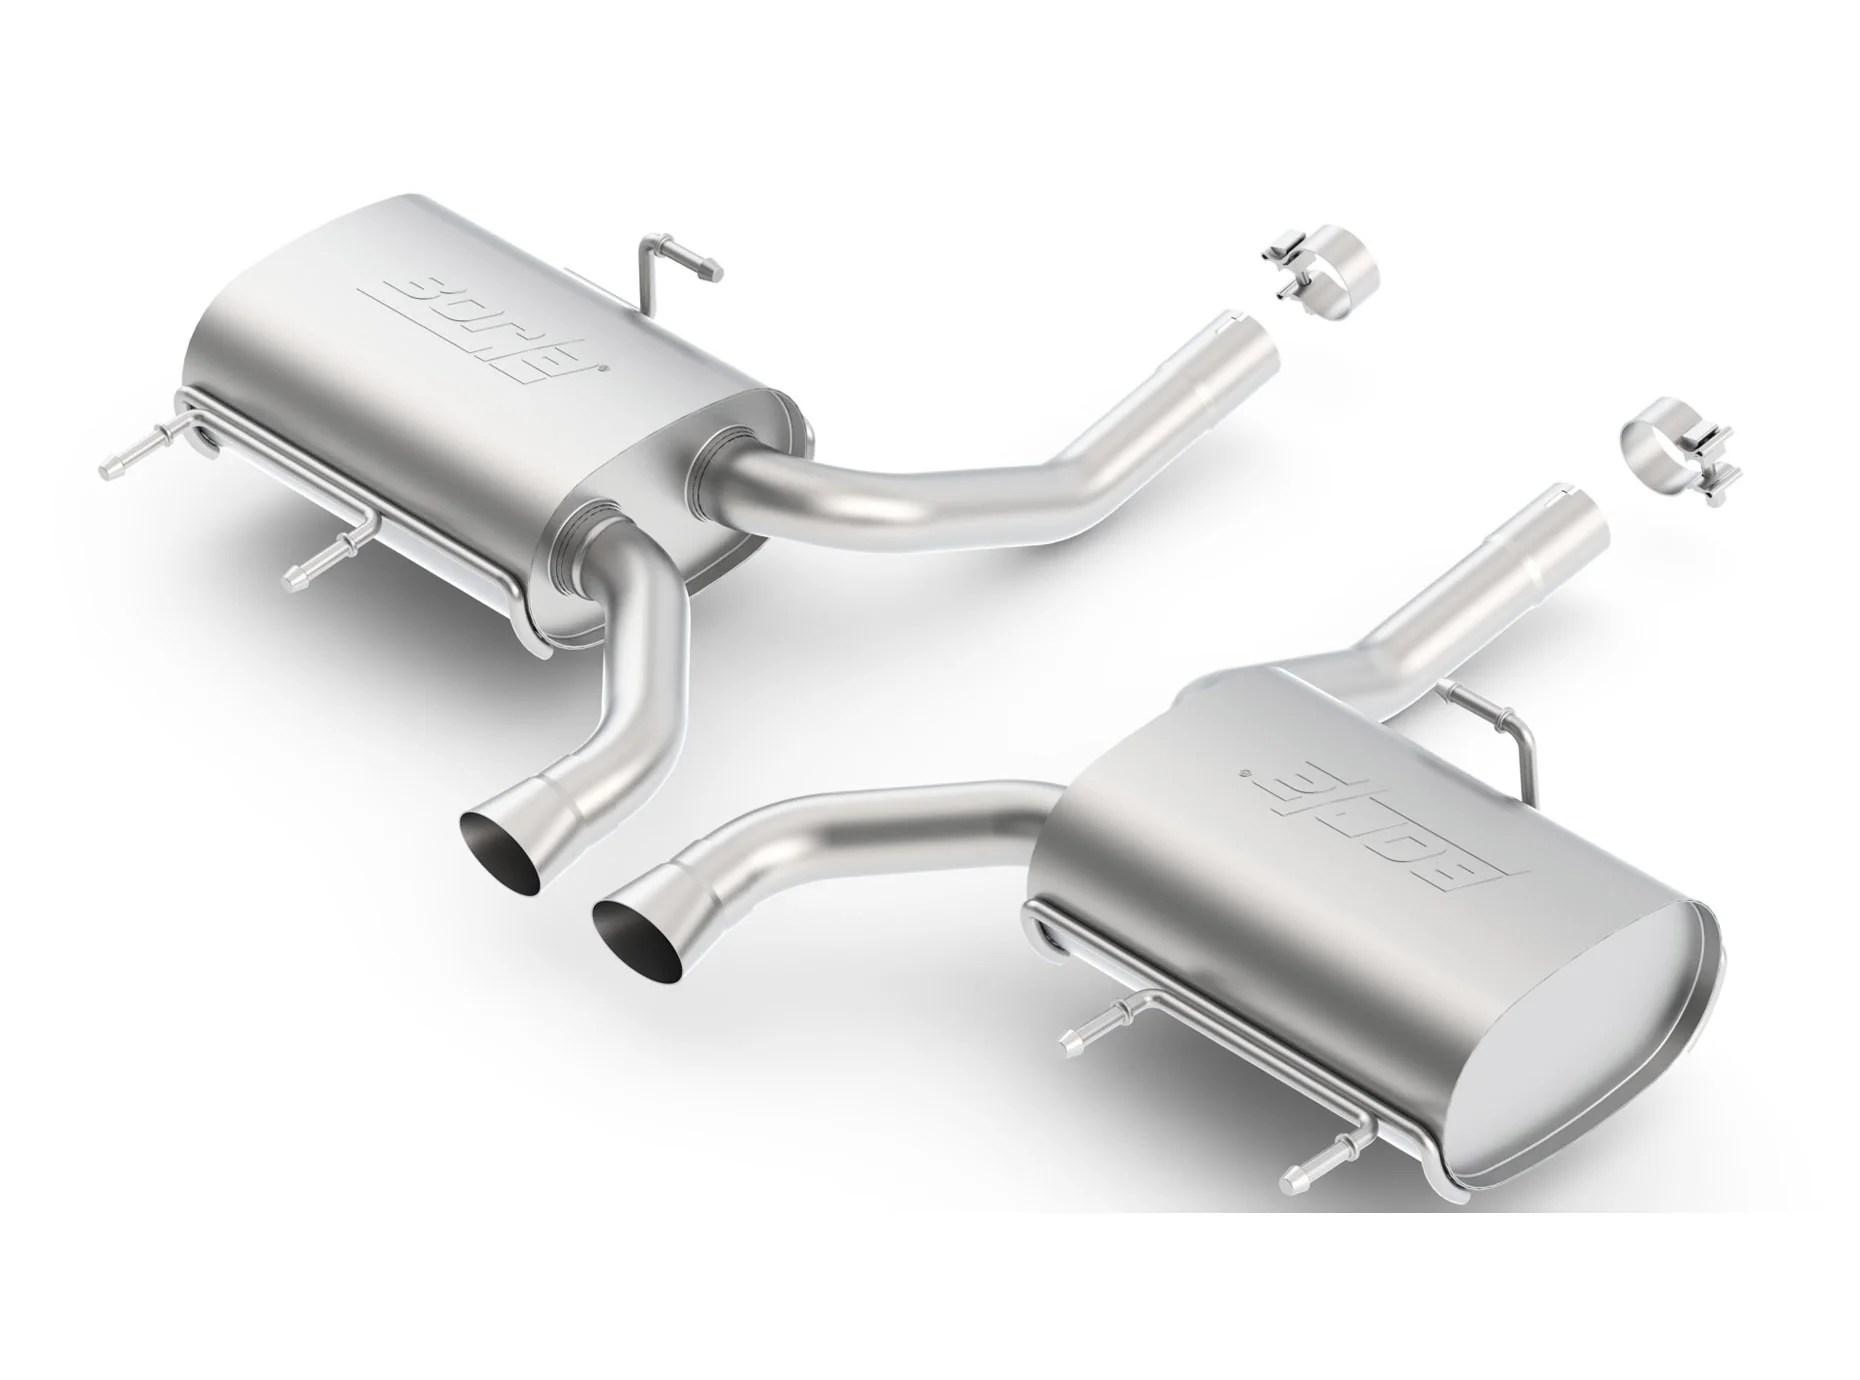 borla axleback exhaust cadillac cts coupe 3 6 v6 w auto trans touring sound 11 14 11824